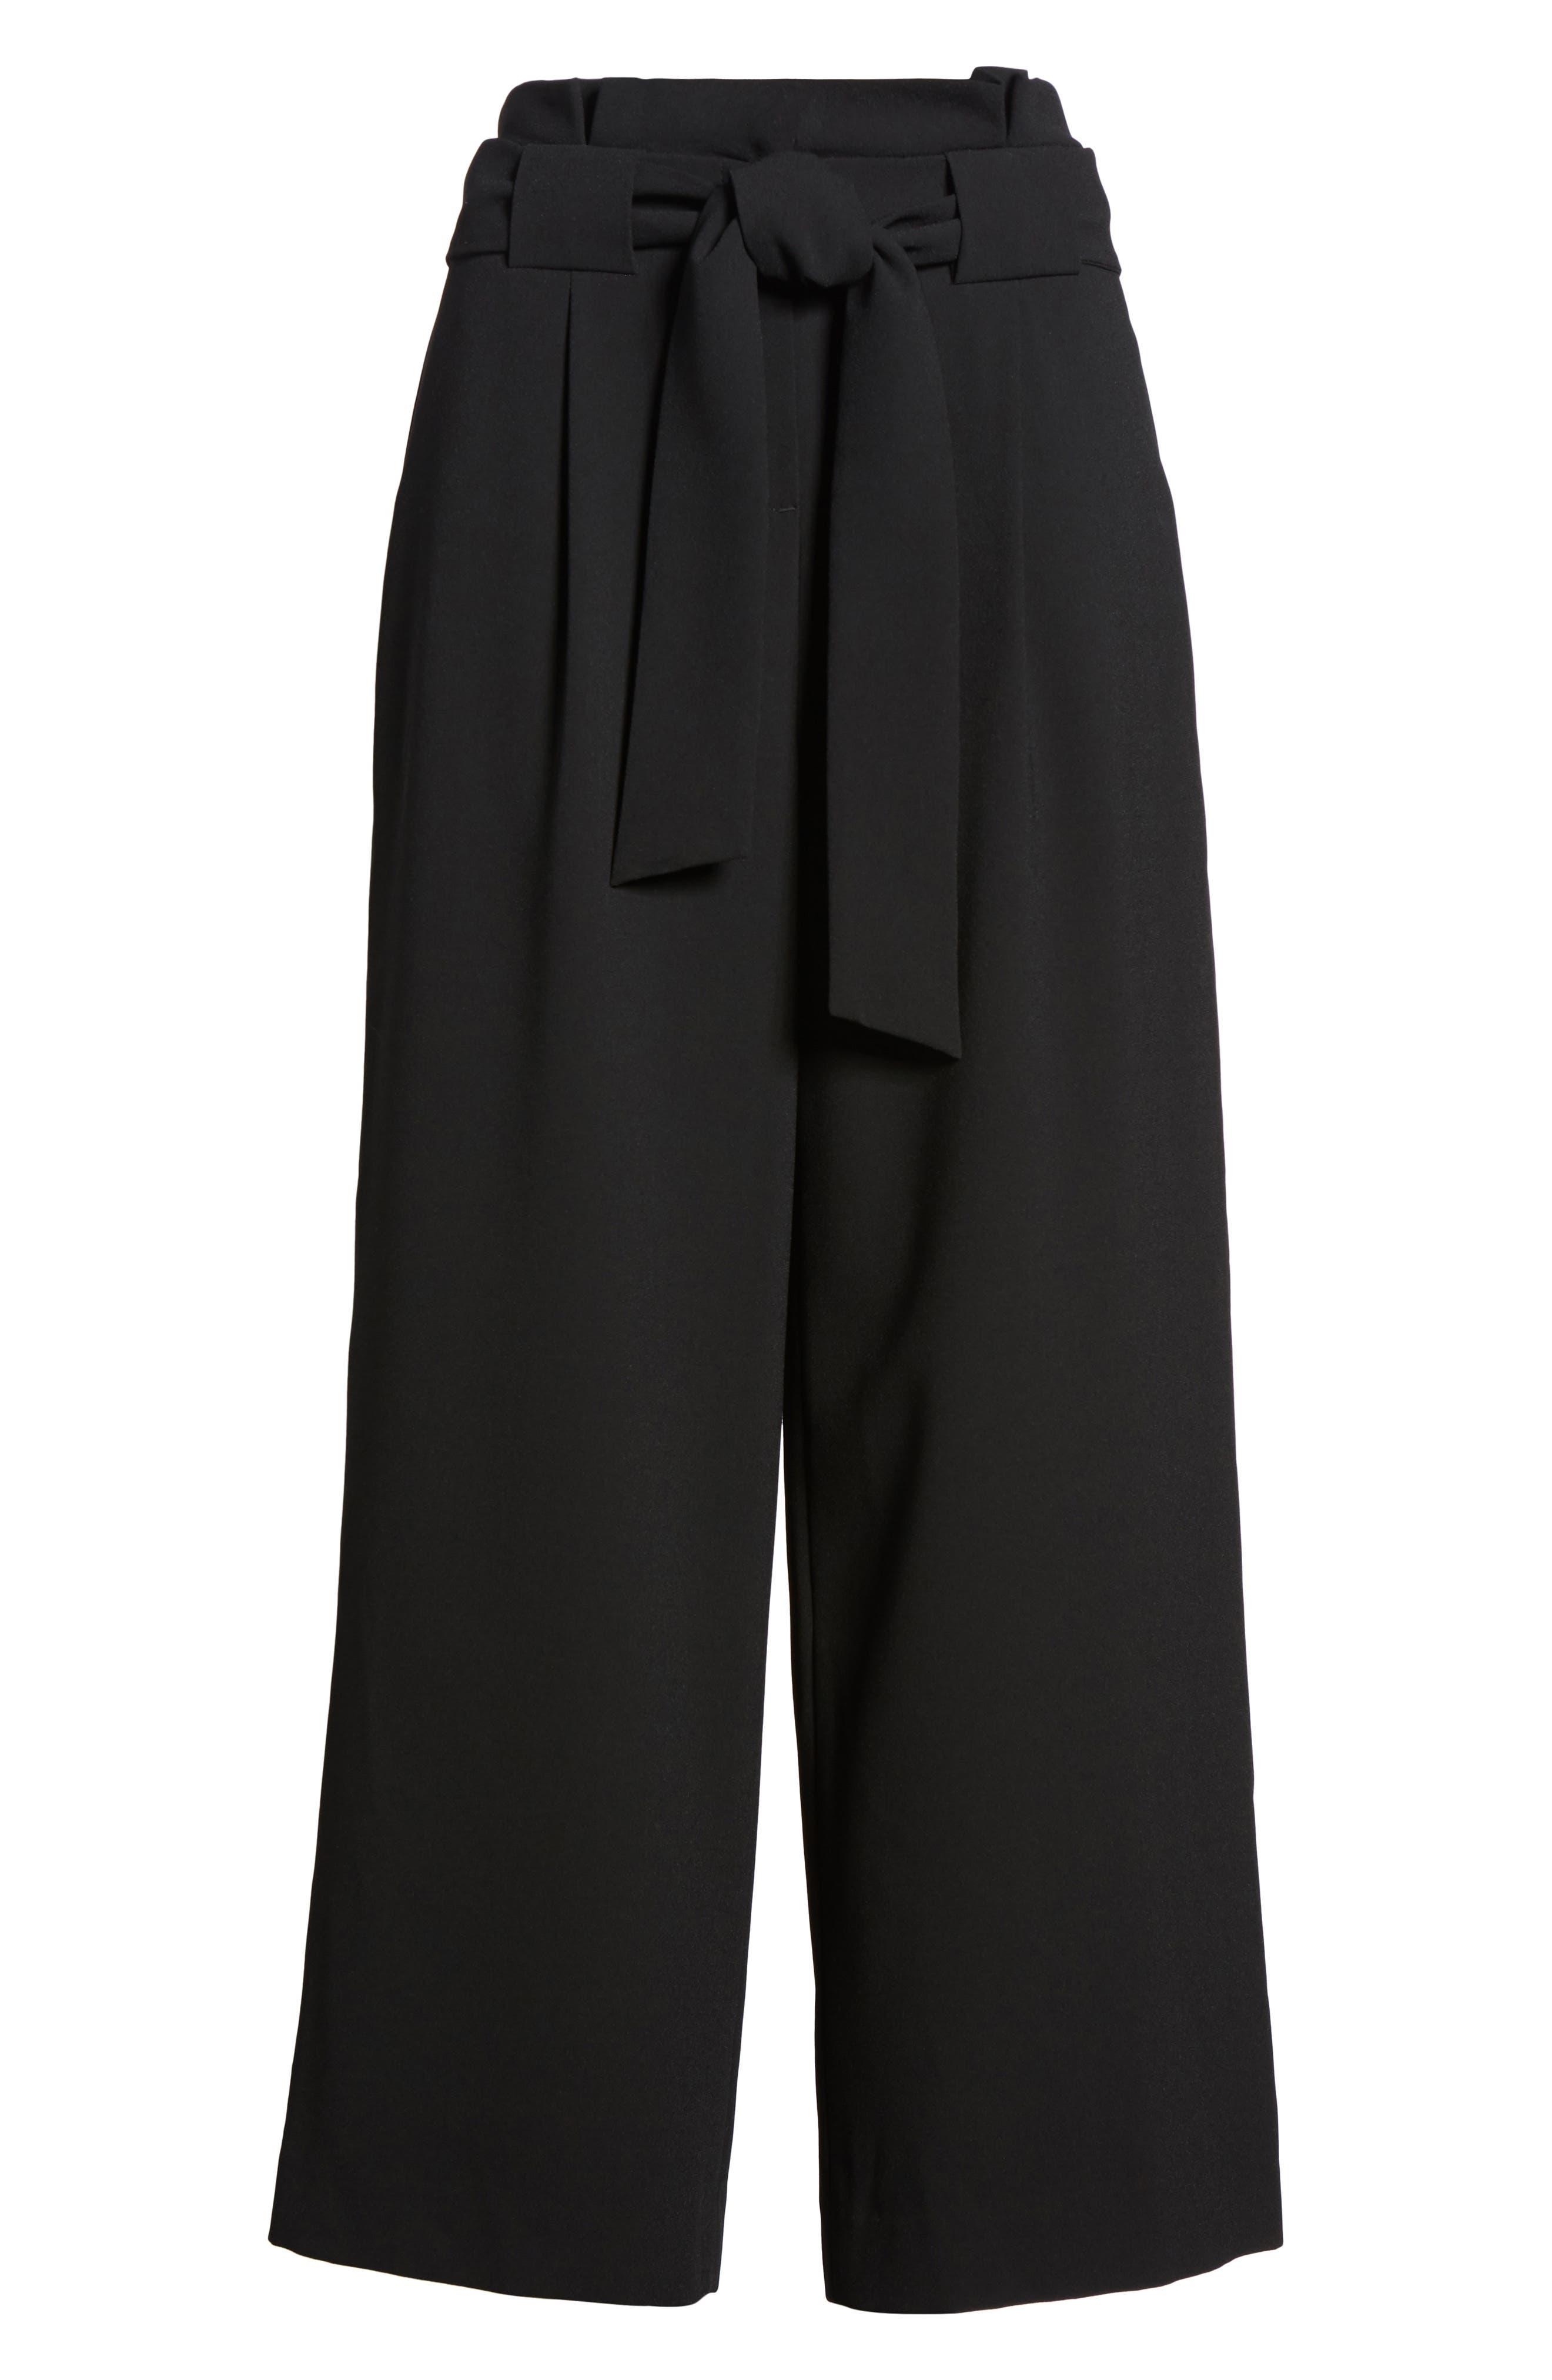 Belted Wide Leg Crop Pants,                             Alternate thumbnail 9, color,                             Black